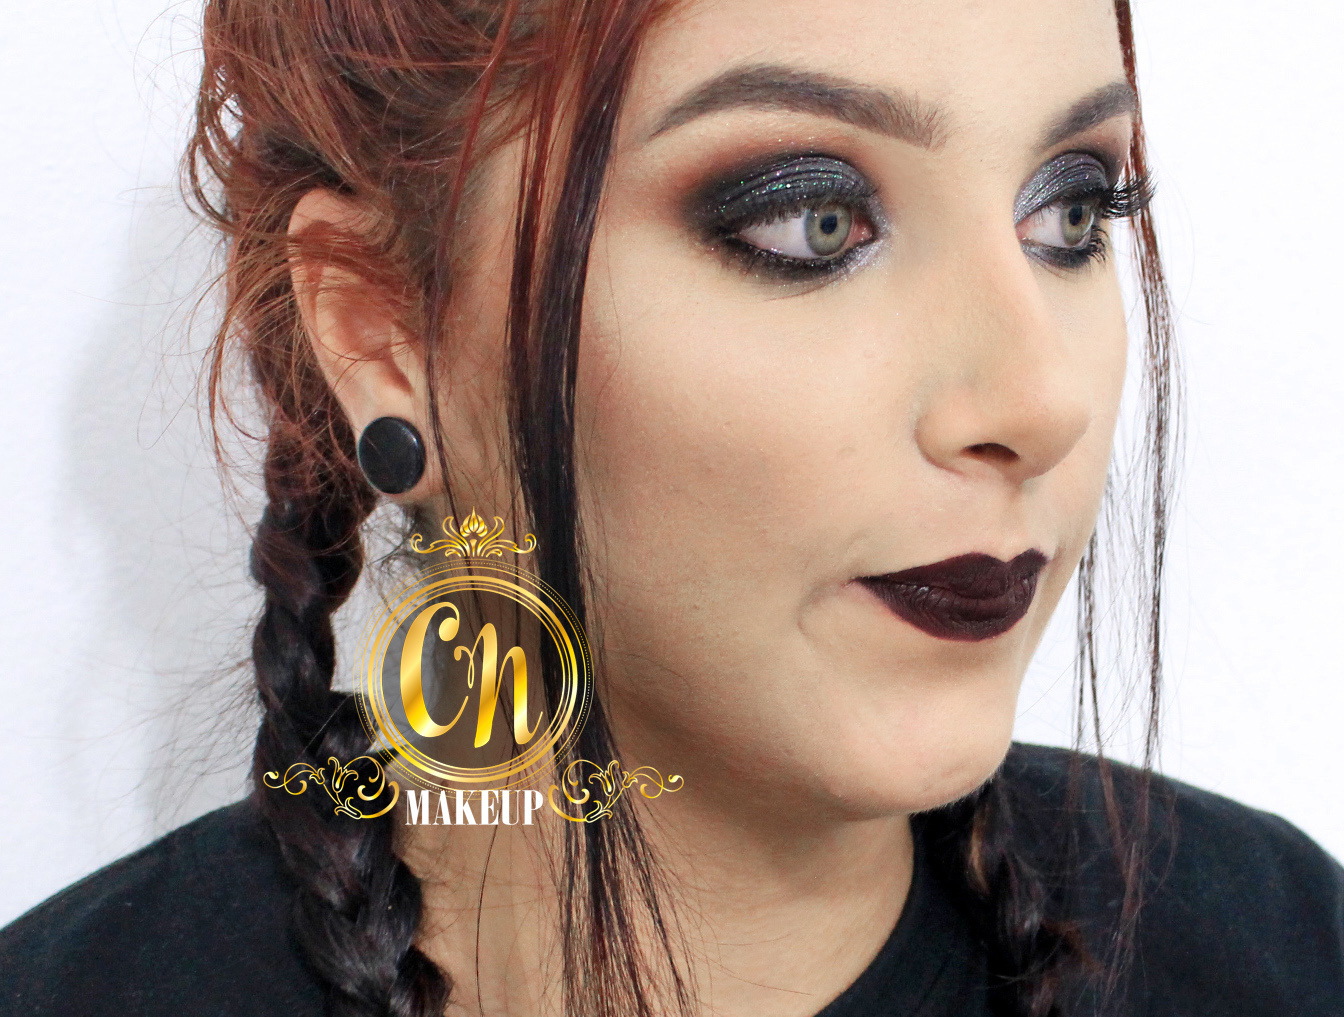 Maquiagem ousada para sair a noite . . #maquiagem #maquiagempro #makeupartist #mua #maquiadoraubatuba #makeup #makeuppro #maquiagemneutra #batomescuro #darklipstick #maquiadora maquiagem maquiador(a)